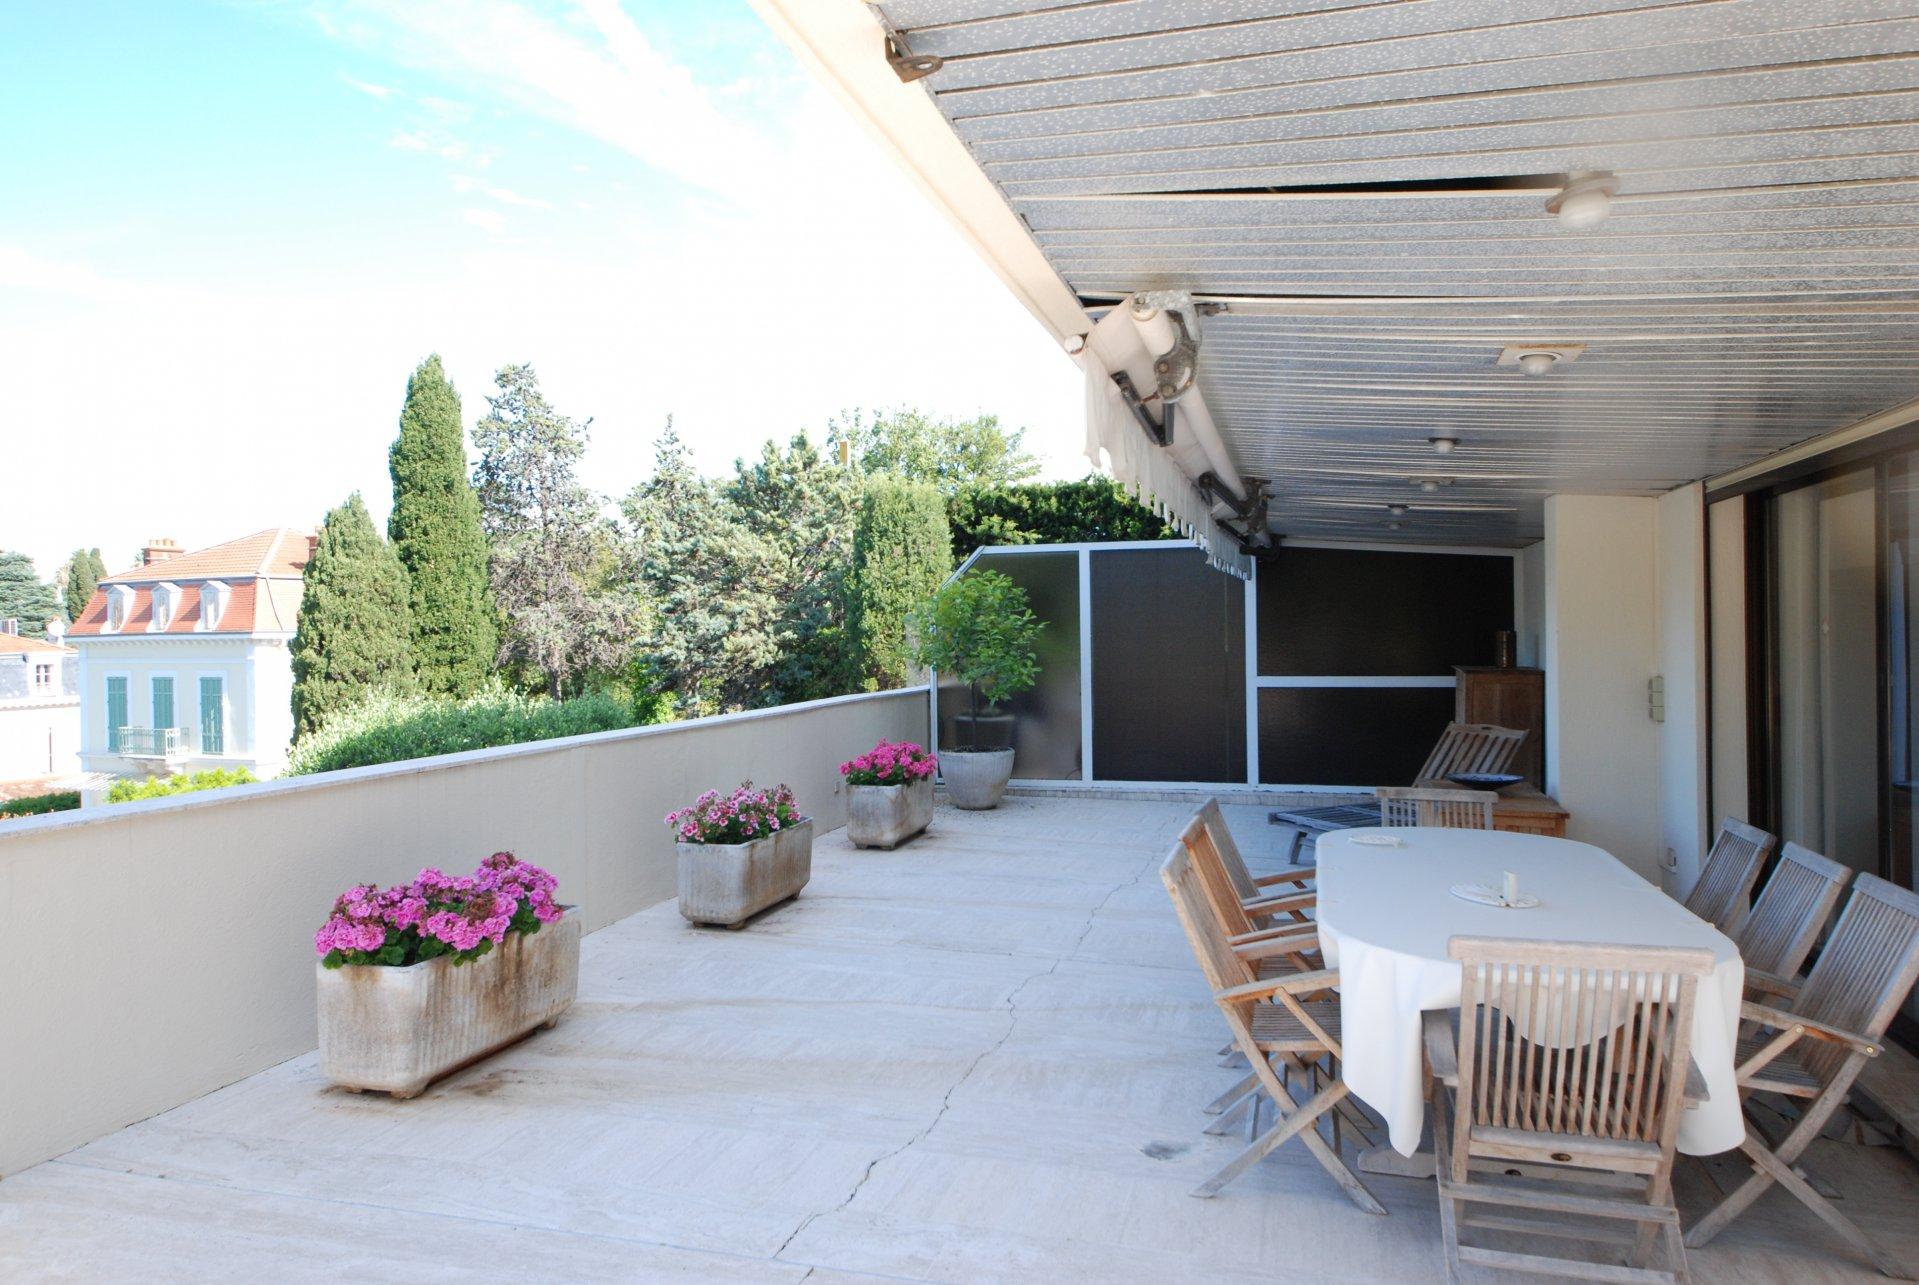 Congress rental Cannes 2 bedroom terrace, swimming pool